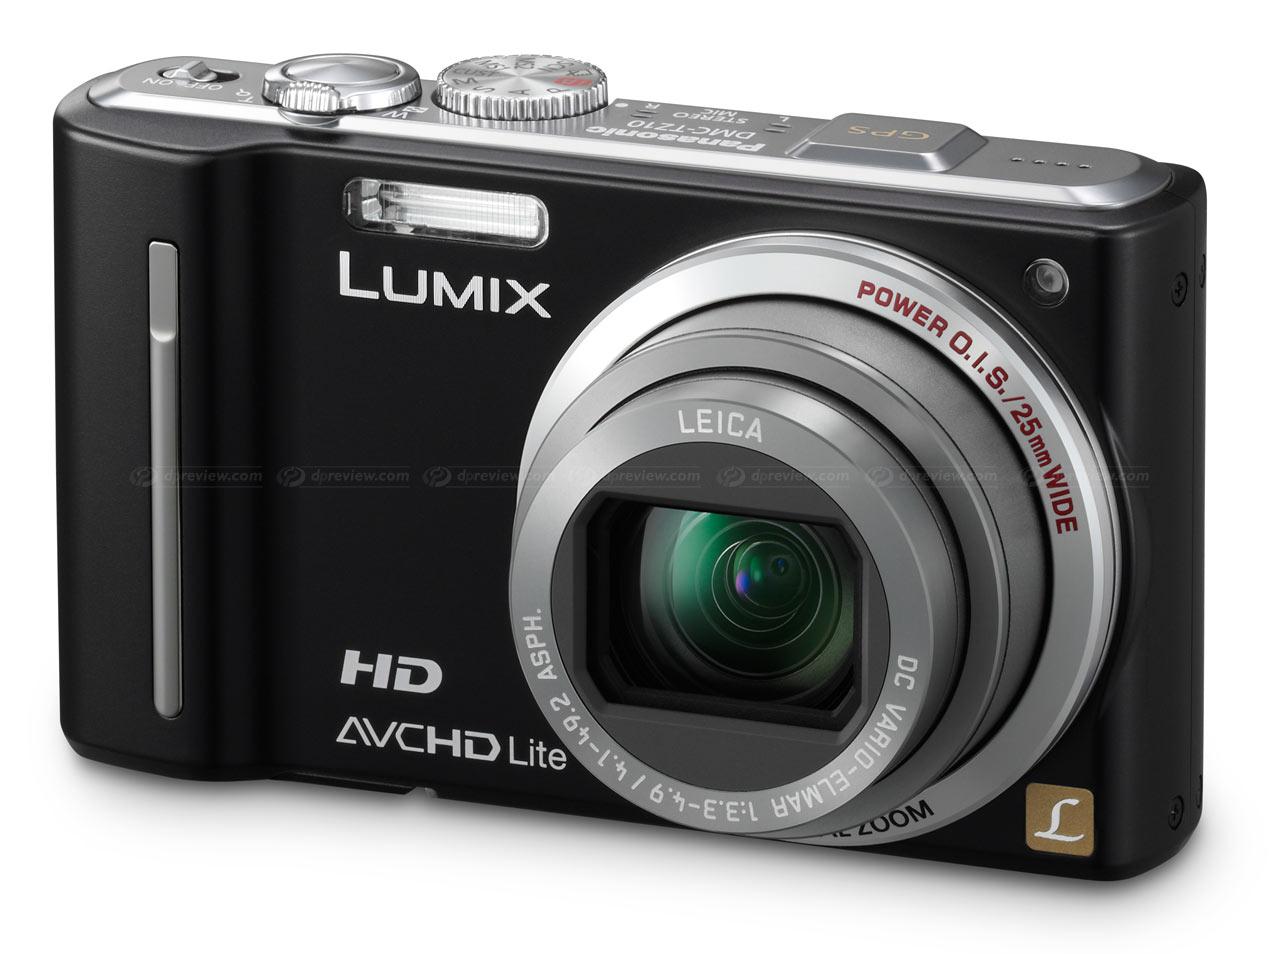 panasonic unveils dmc zs7 tz10 with built in gps digital rh dpreview com Panasonic Lumix DMC GX7 Newest Panasonic Lumix Camera